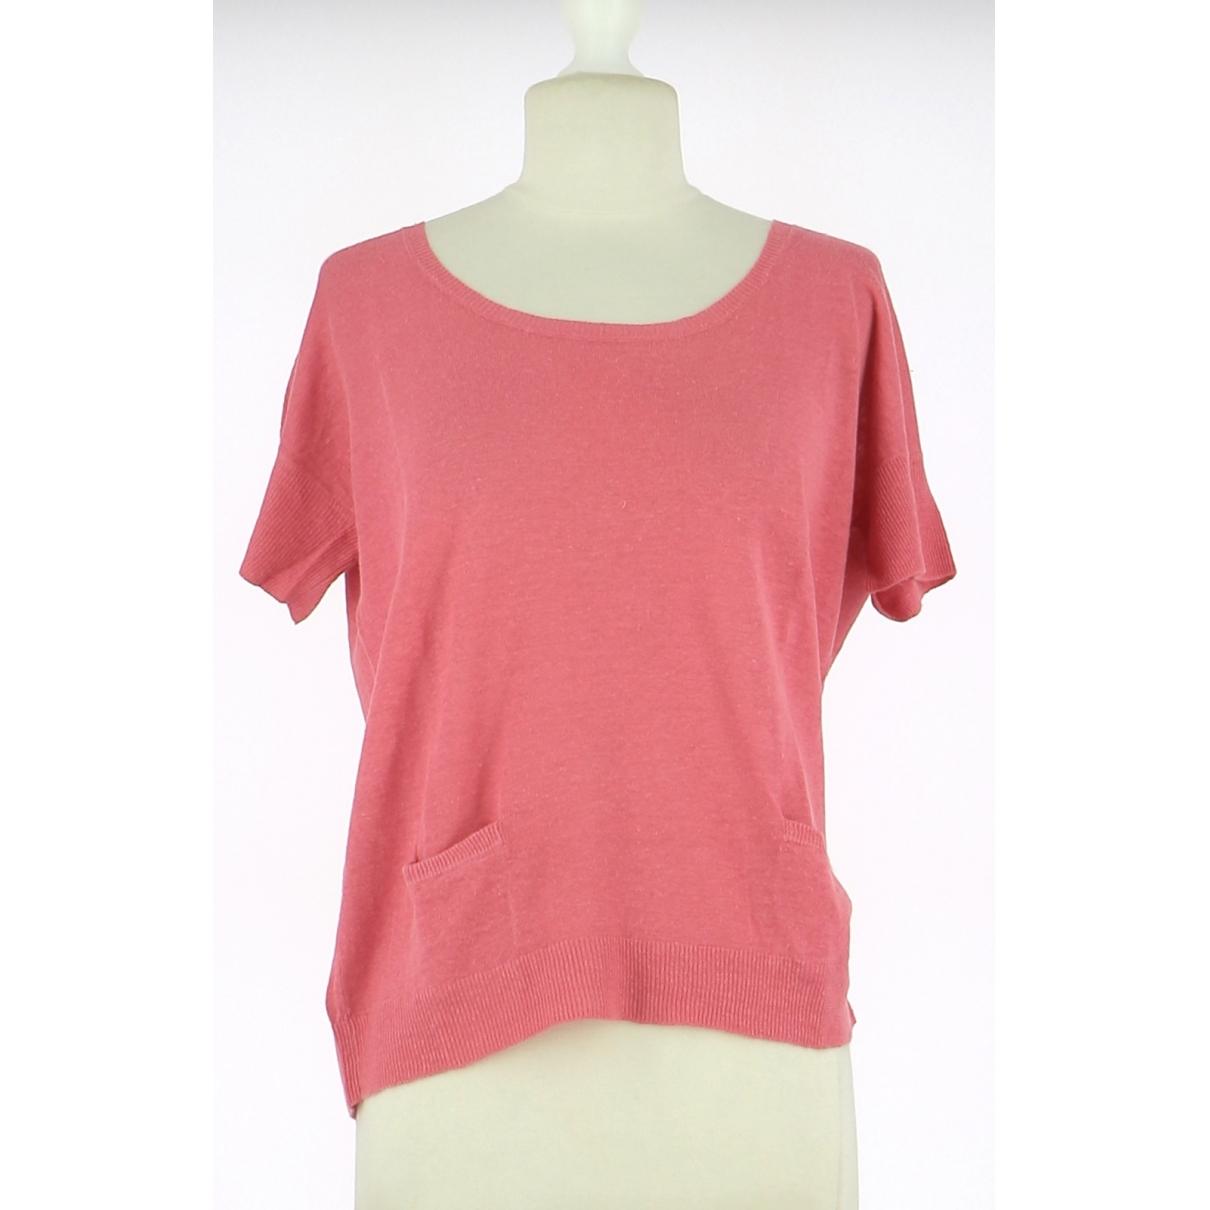 Gerard Darel - Top   pour femme en lin - rose